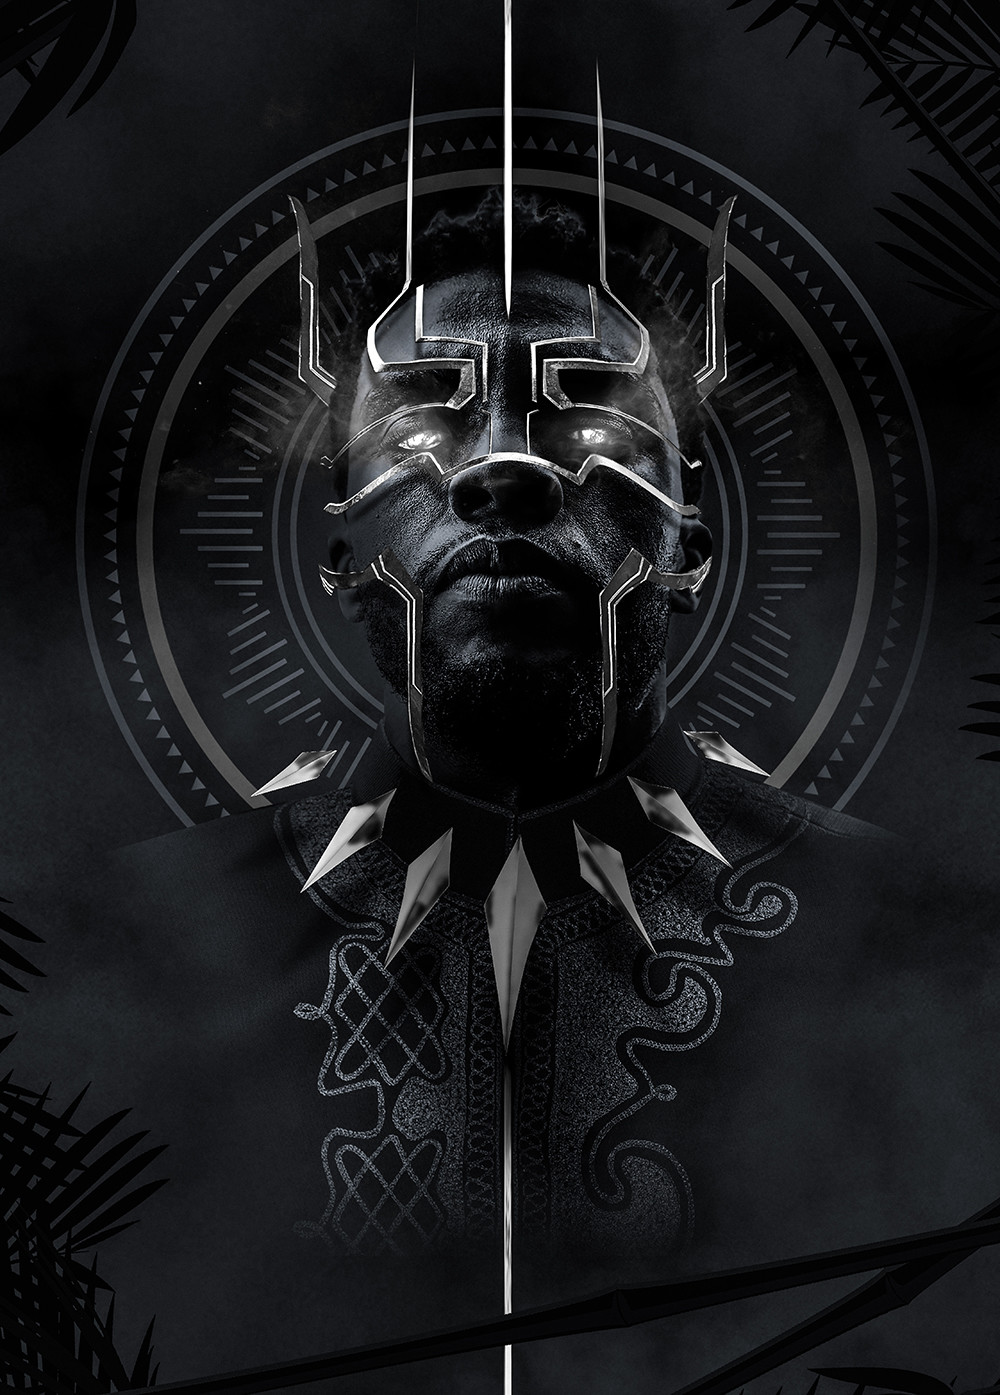 Kode lgx the king is dex silver